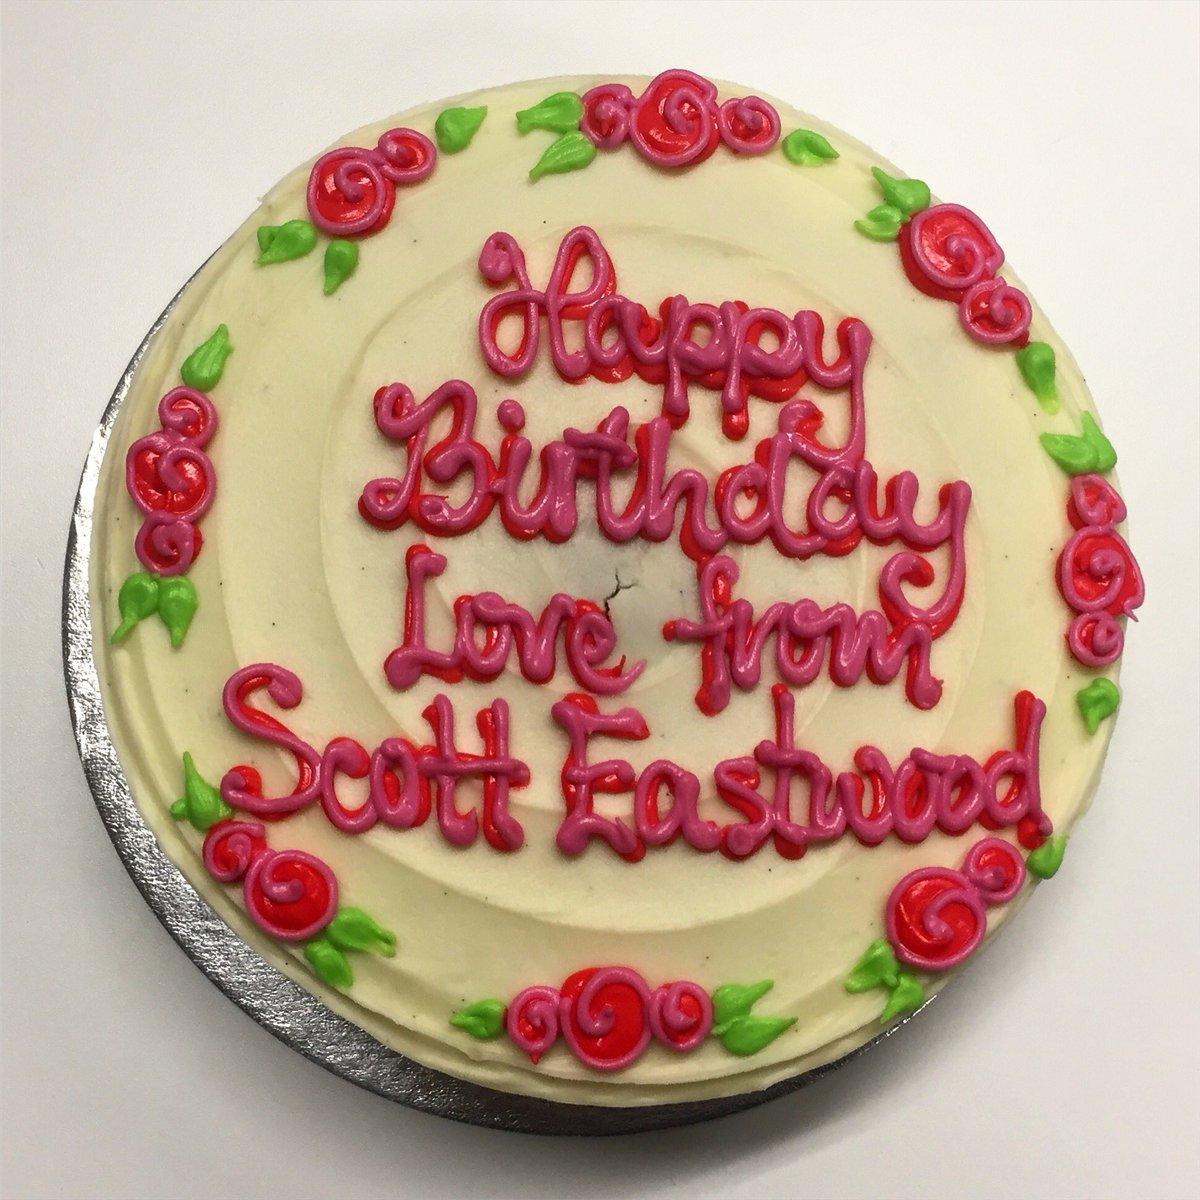 Melissa Nathoo On Twitter Last Year My Work Birthday Cake Was From